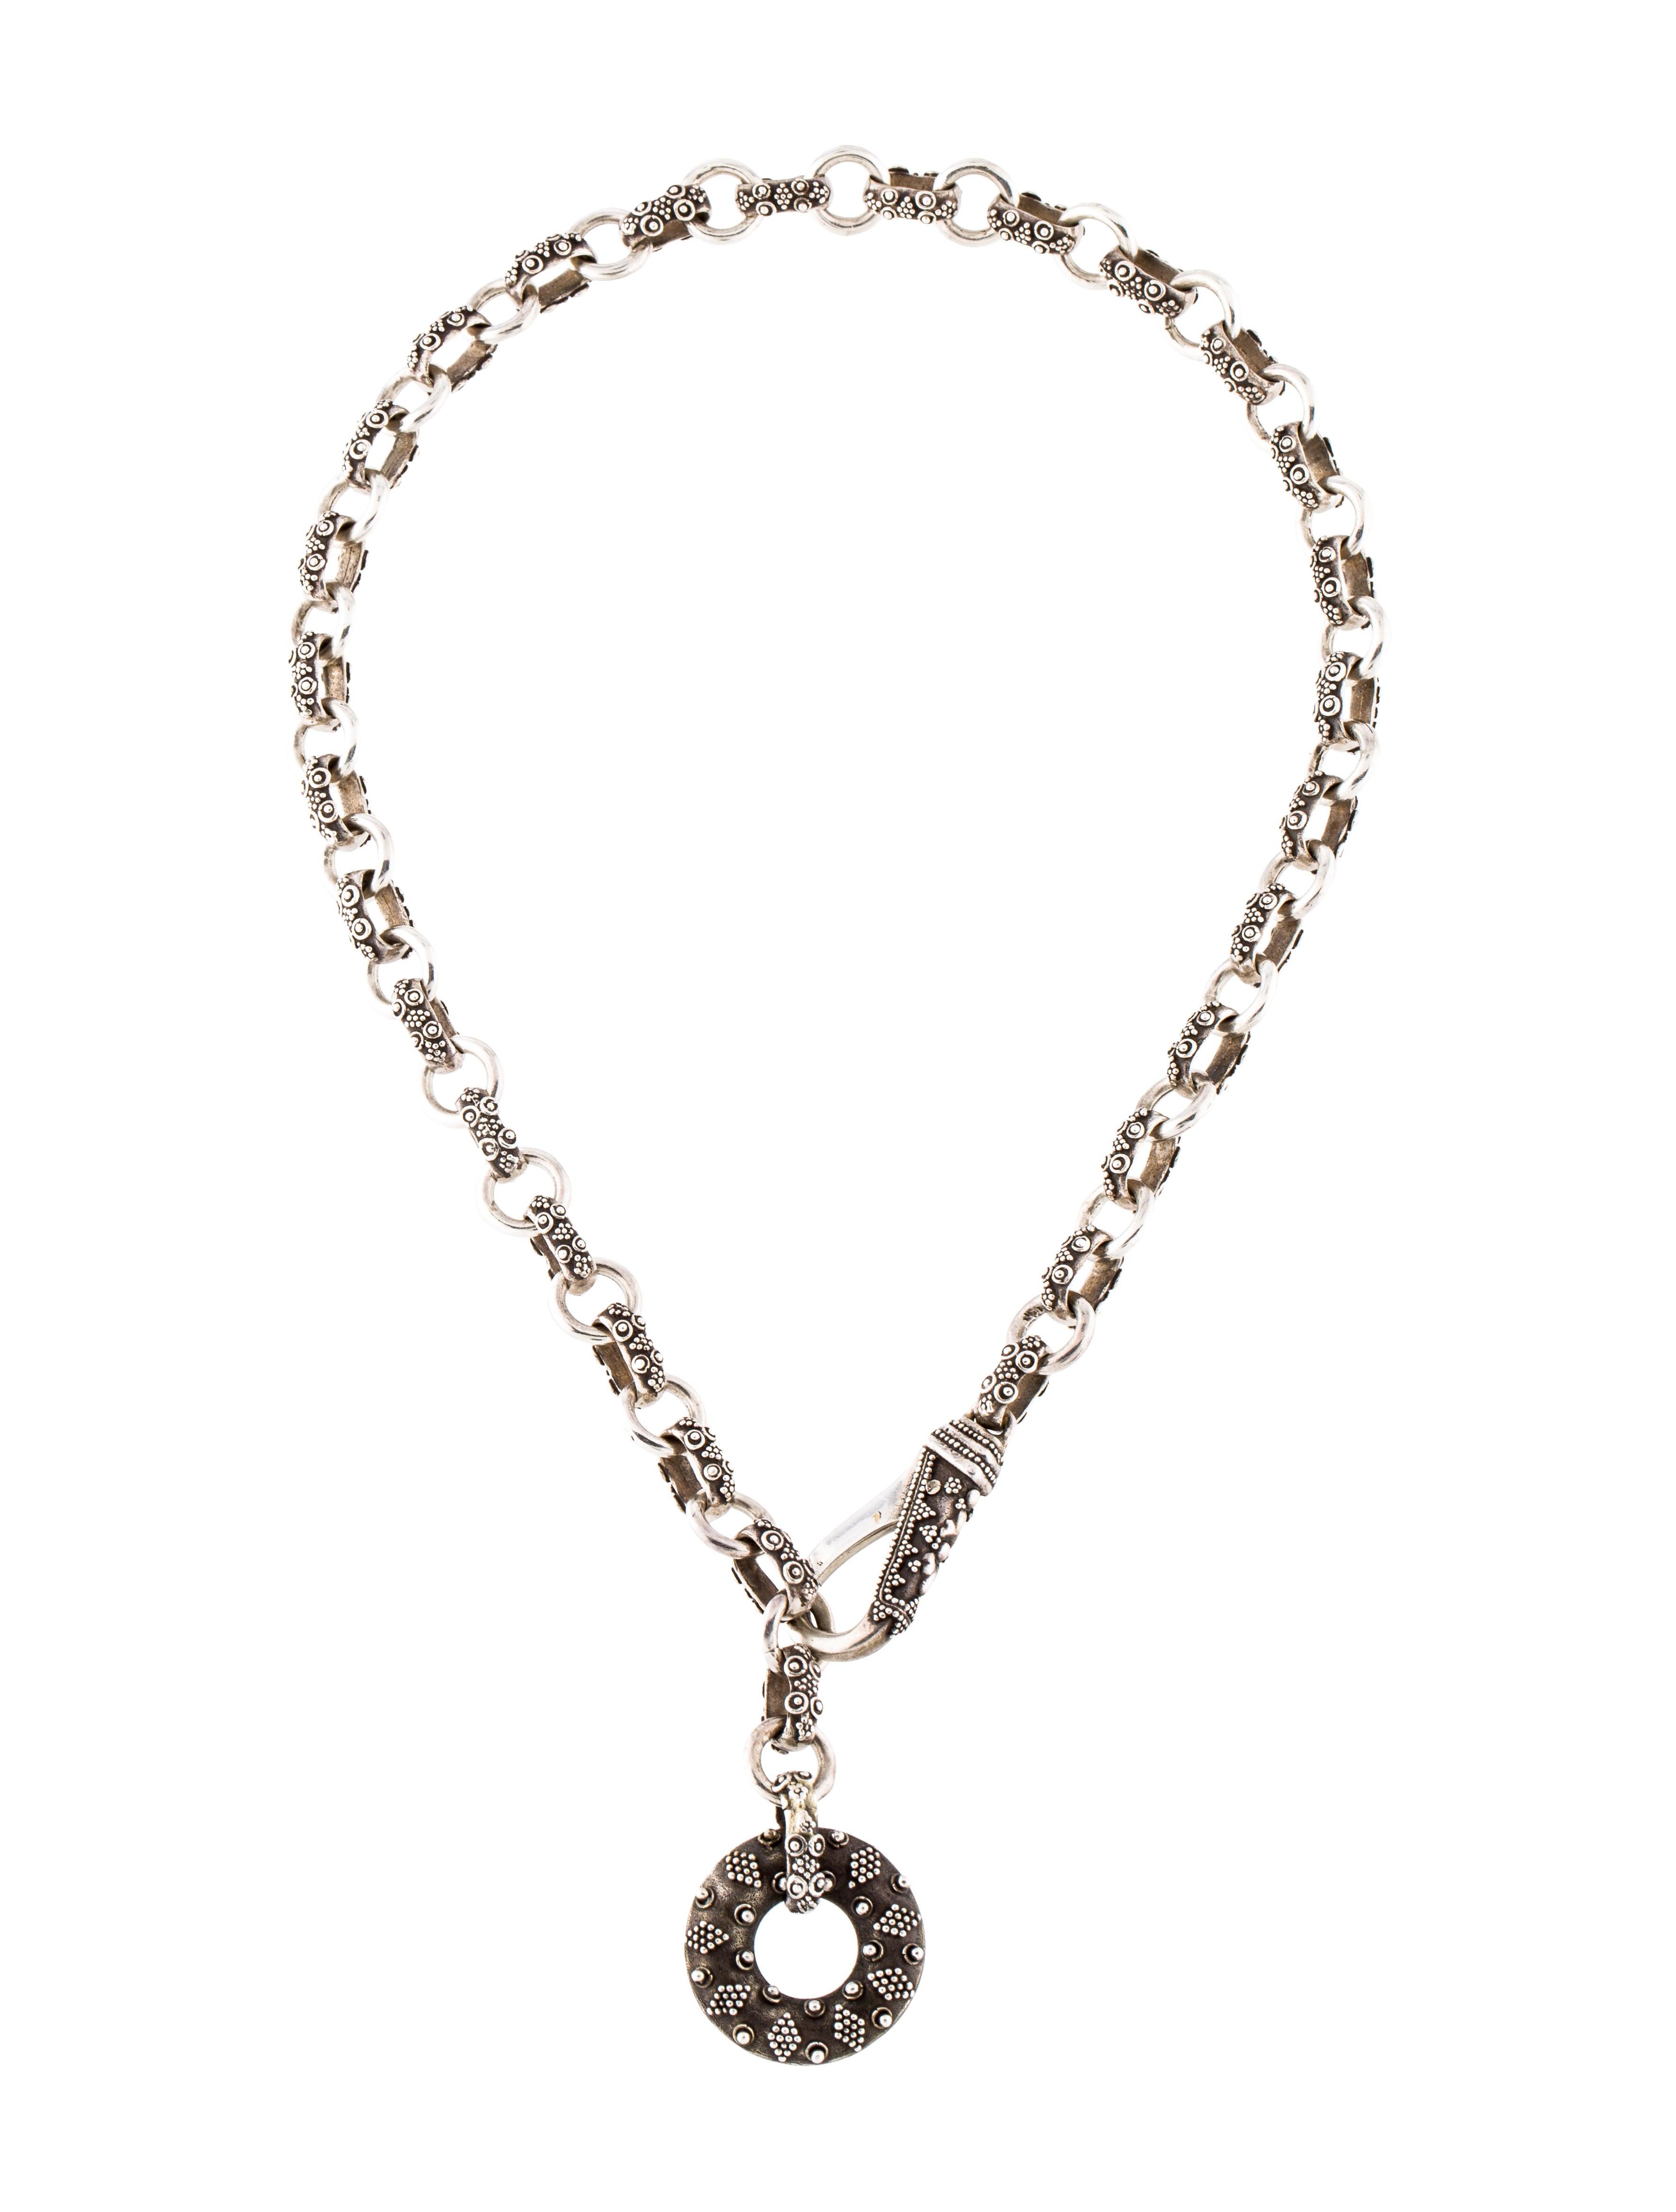 John hardy circle pendant necklace necklaces jha29889 the realreal circle pendant necklace aloadofball Choice Image